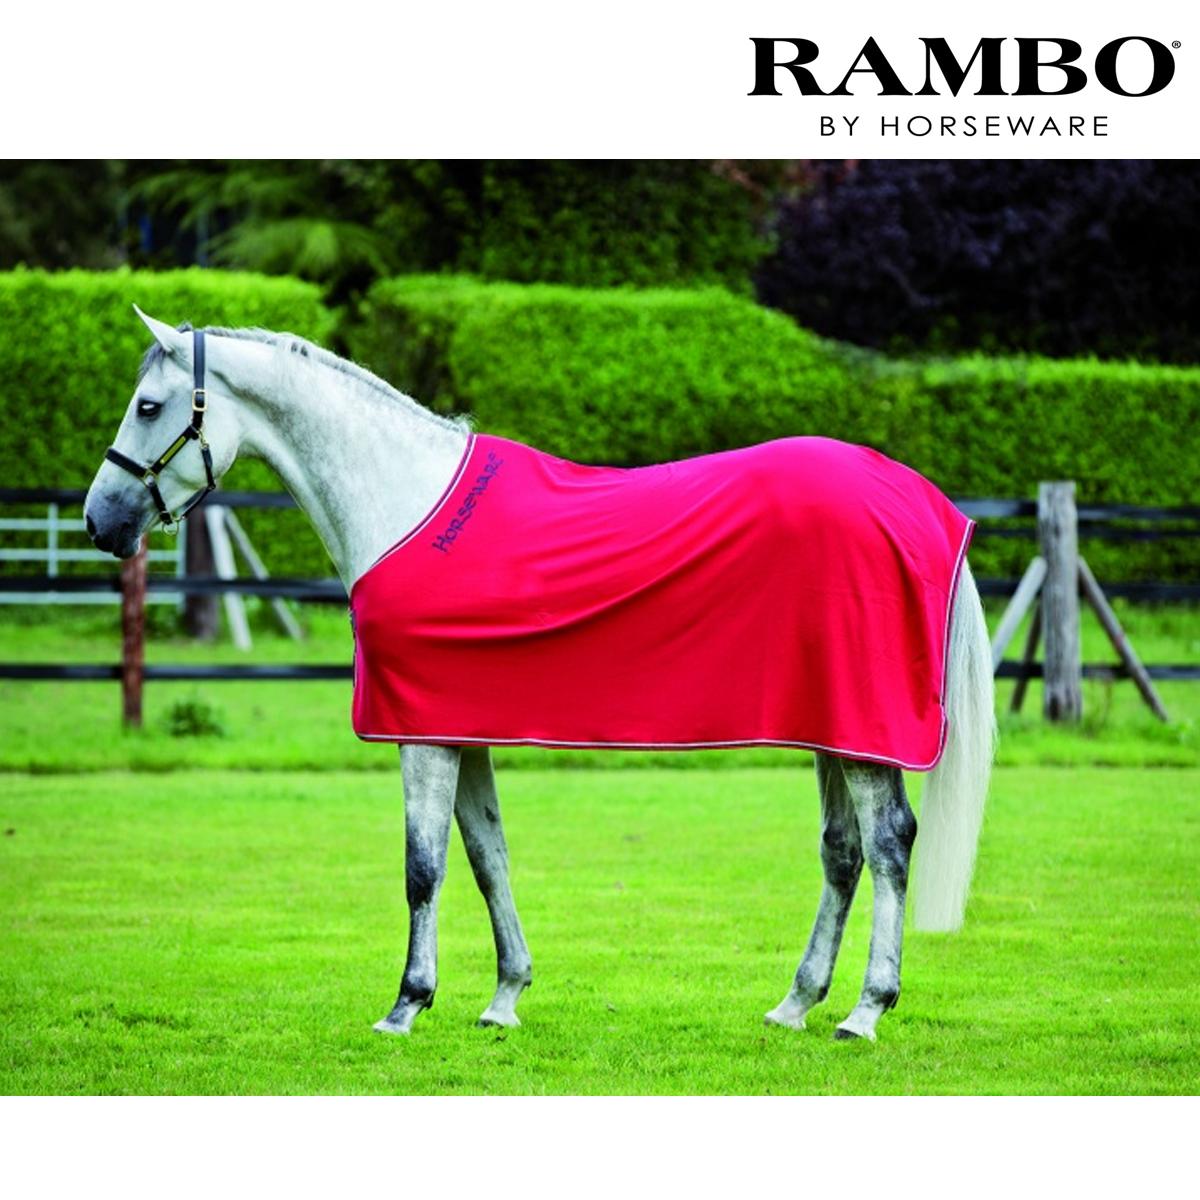 Horseware RAMBO cotone Cooler Rug